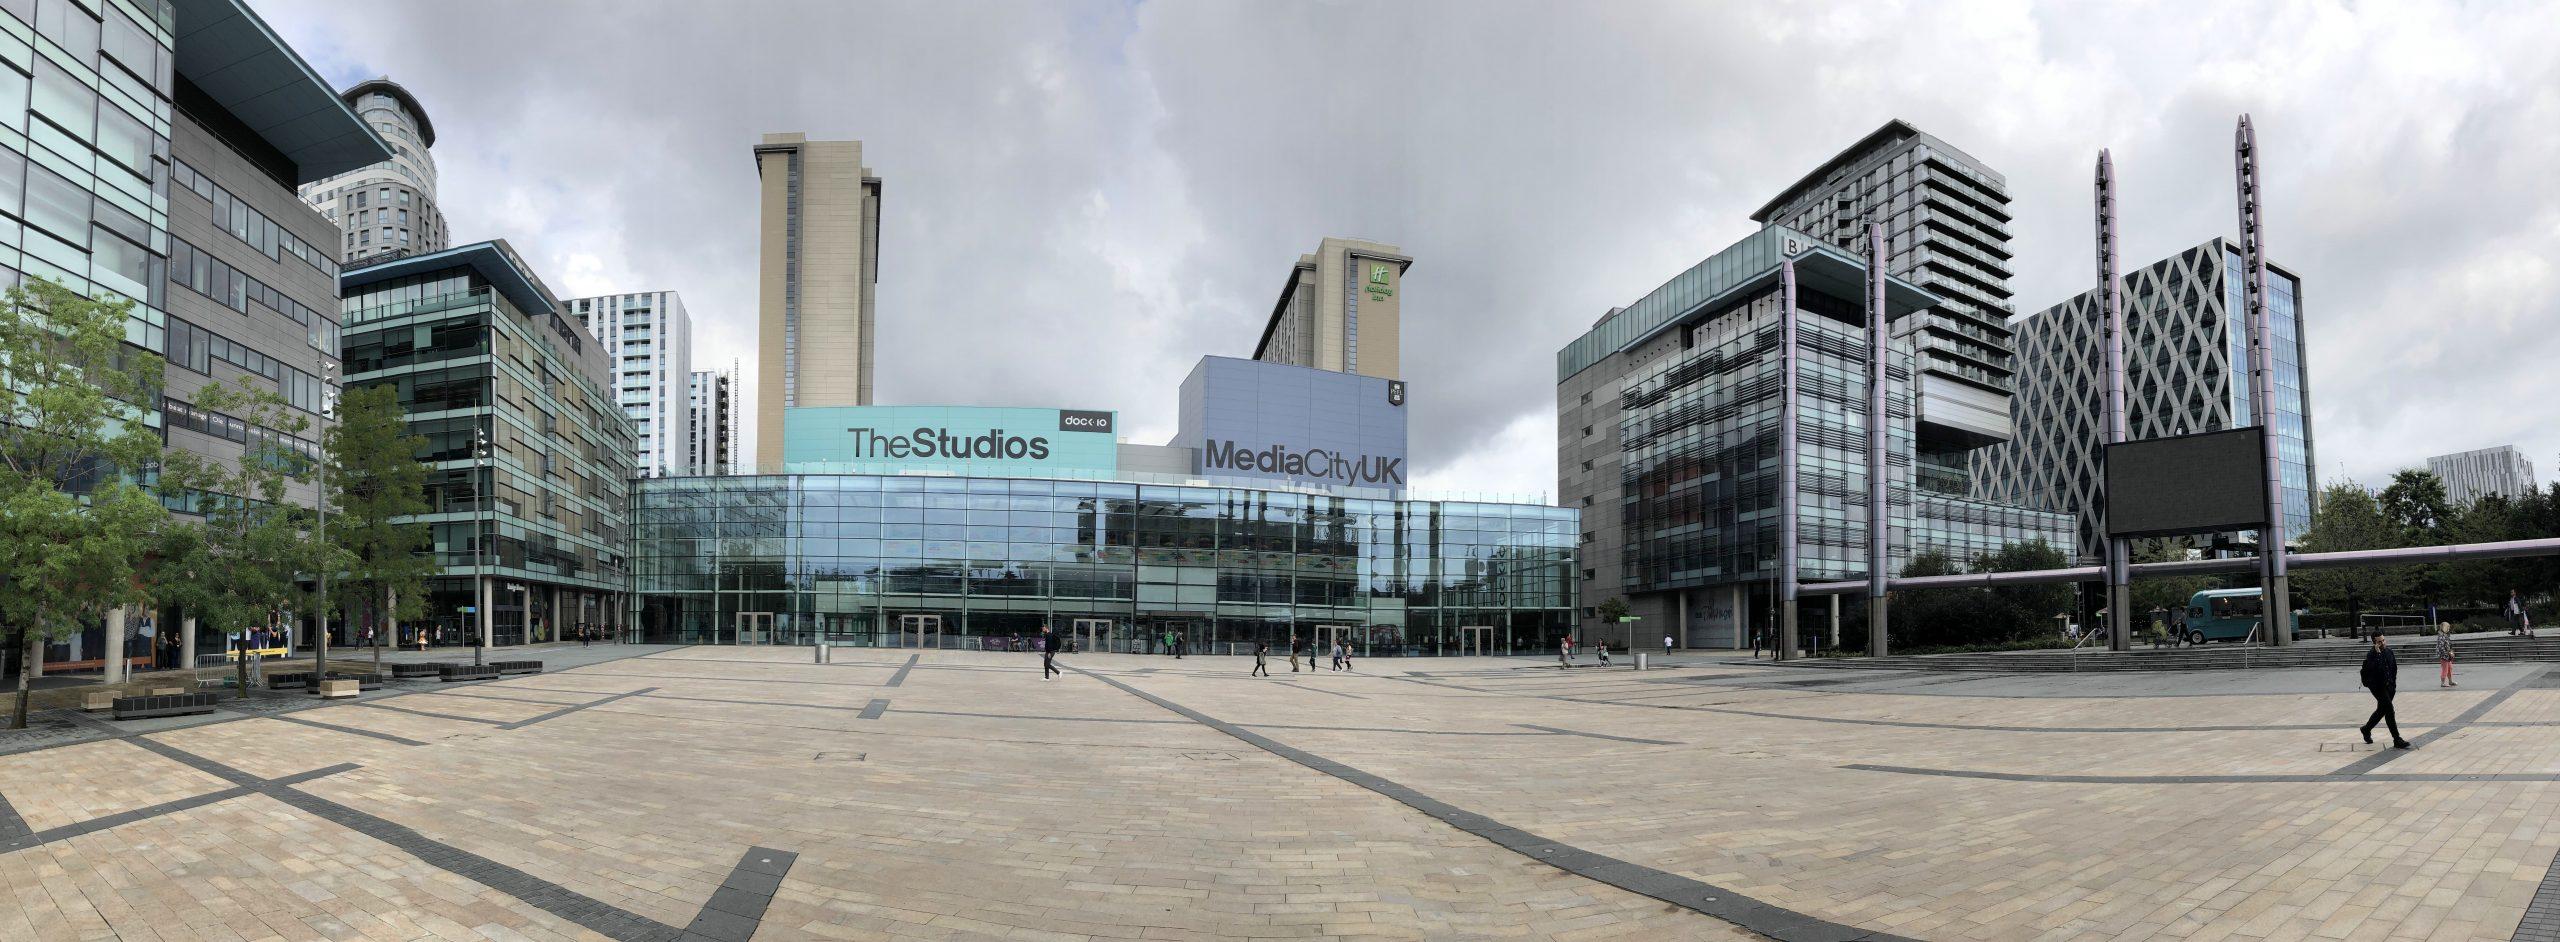 An image of The Studios at MediaCityUK in Salford